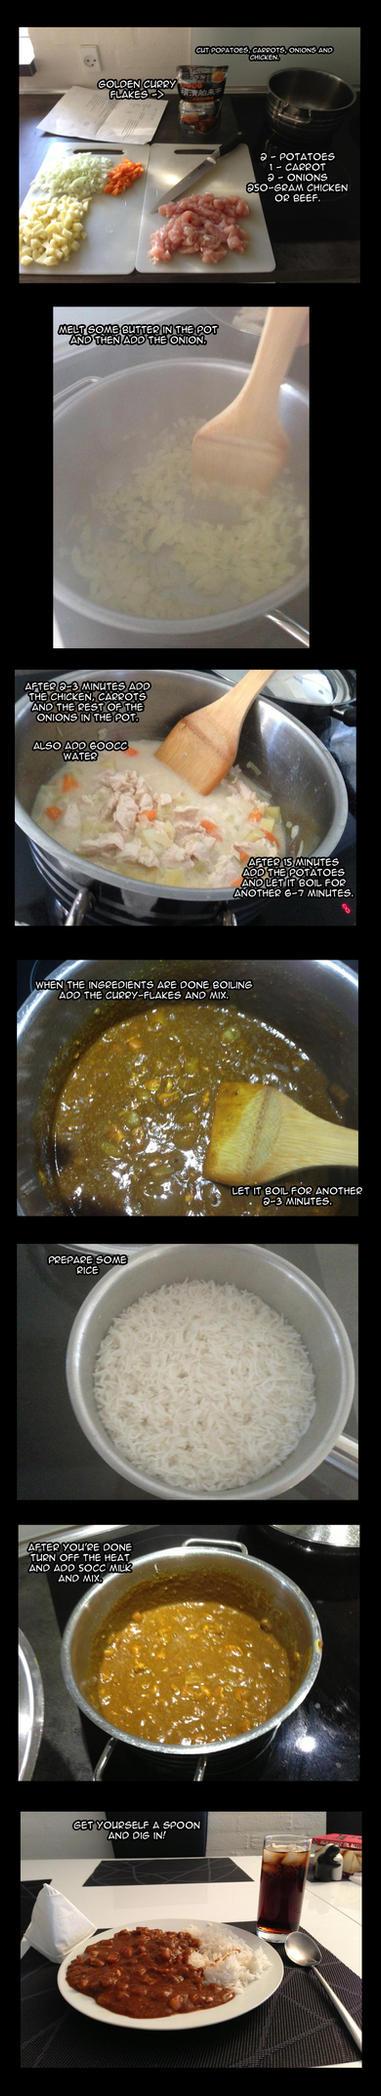 Homemade Japanese - Golden Curry by Edowaado